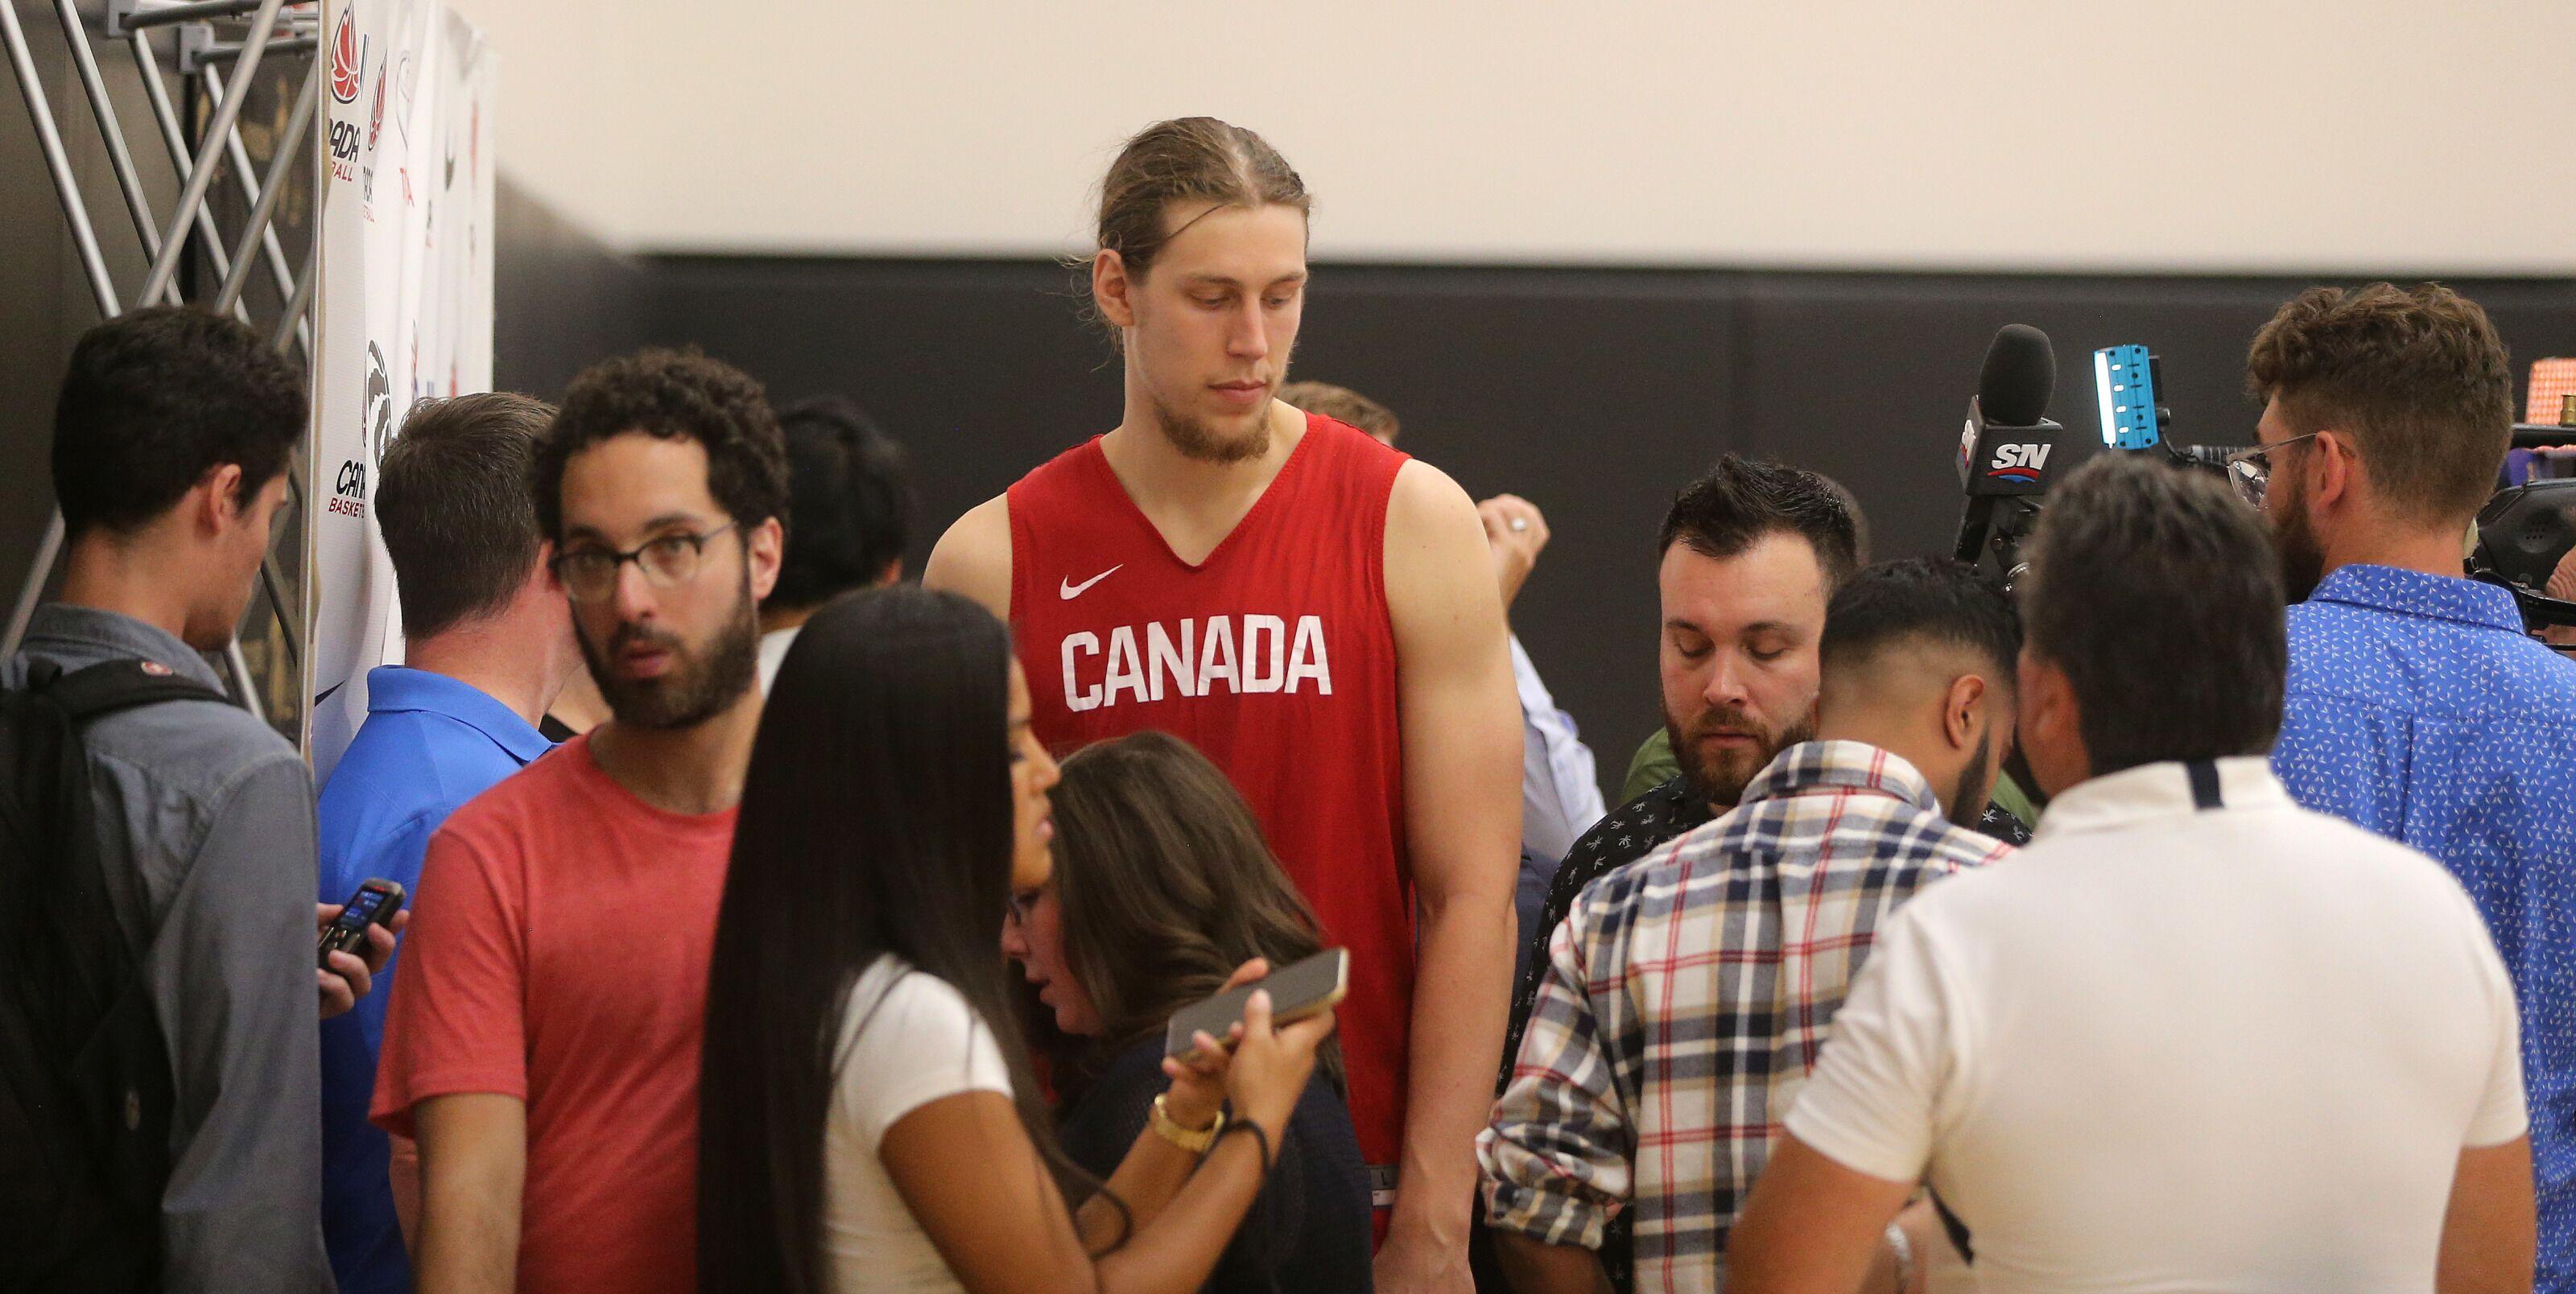 Miami Heat: Kelly Olynyk to miss FIBA World Cup for Team Canada